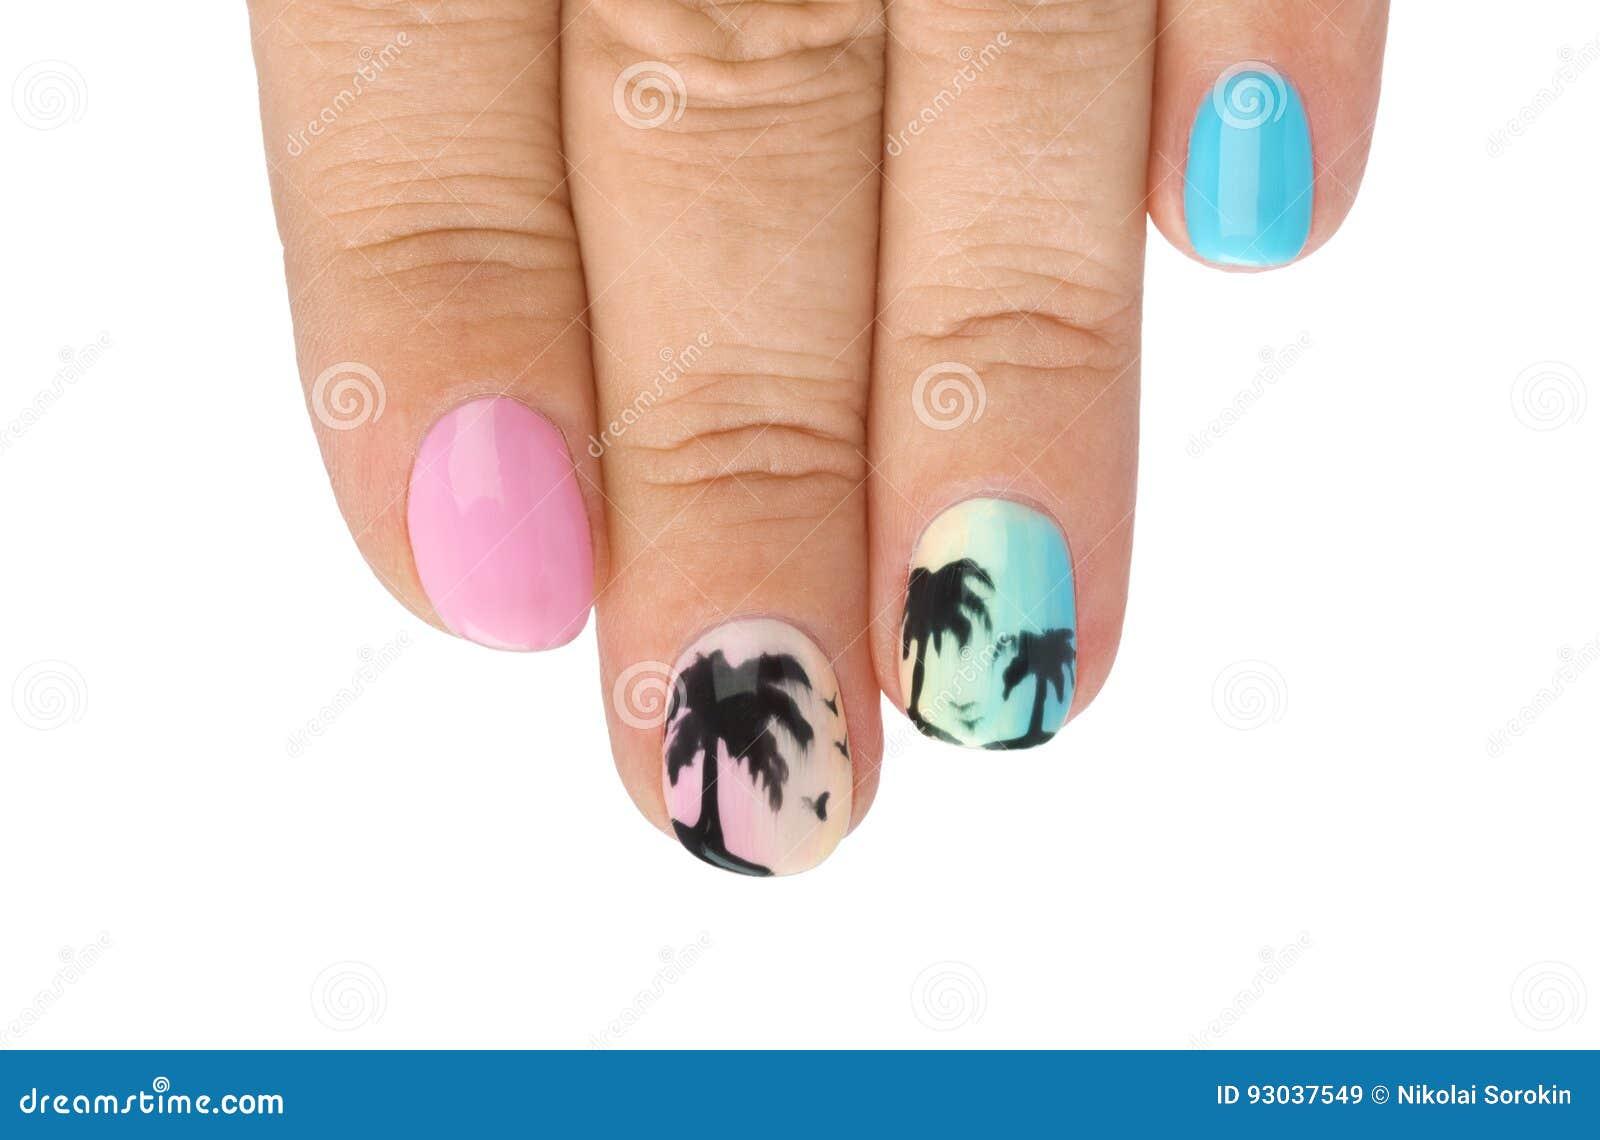 Wunderbar Muster Fingernägel Beste Wahl Fingernagel Mit